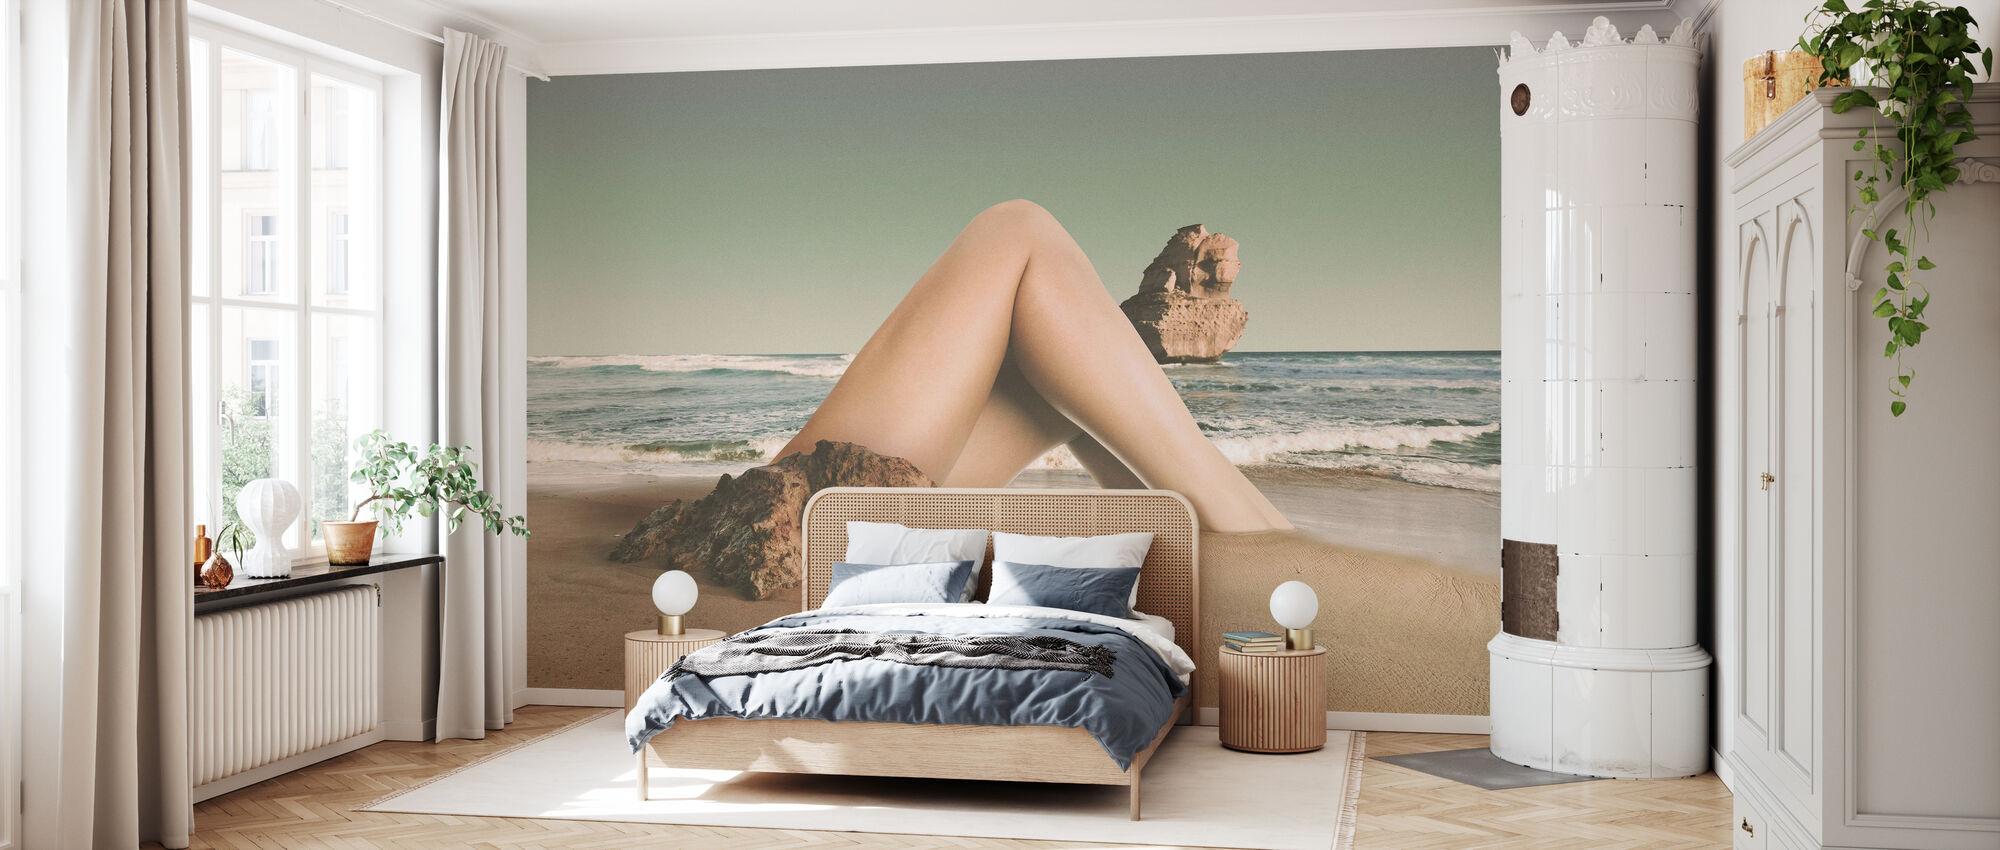 Leg - Wallpaper - Bedroom